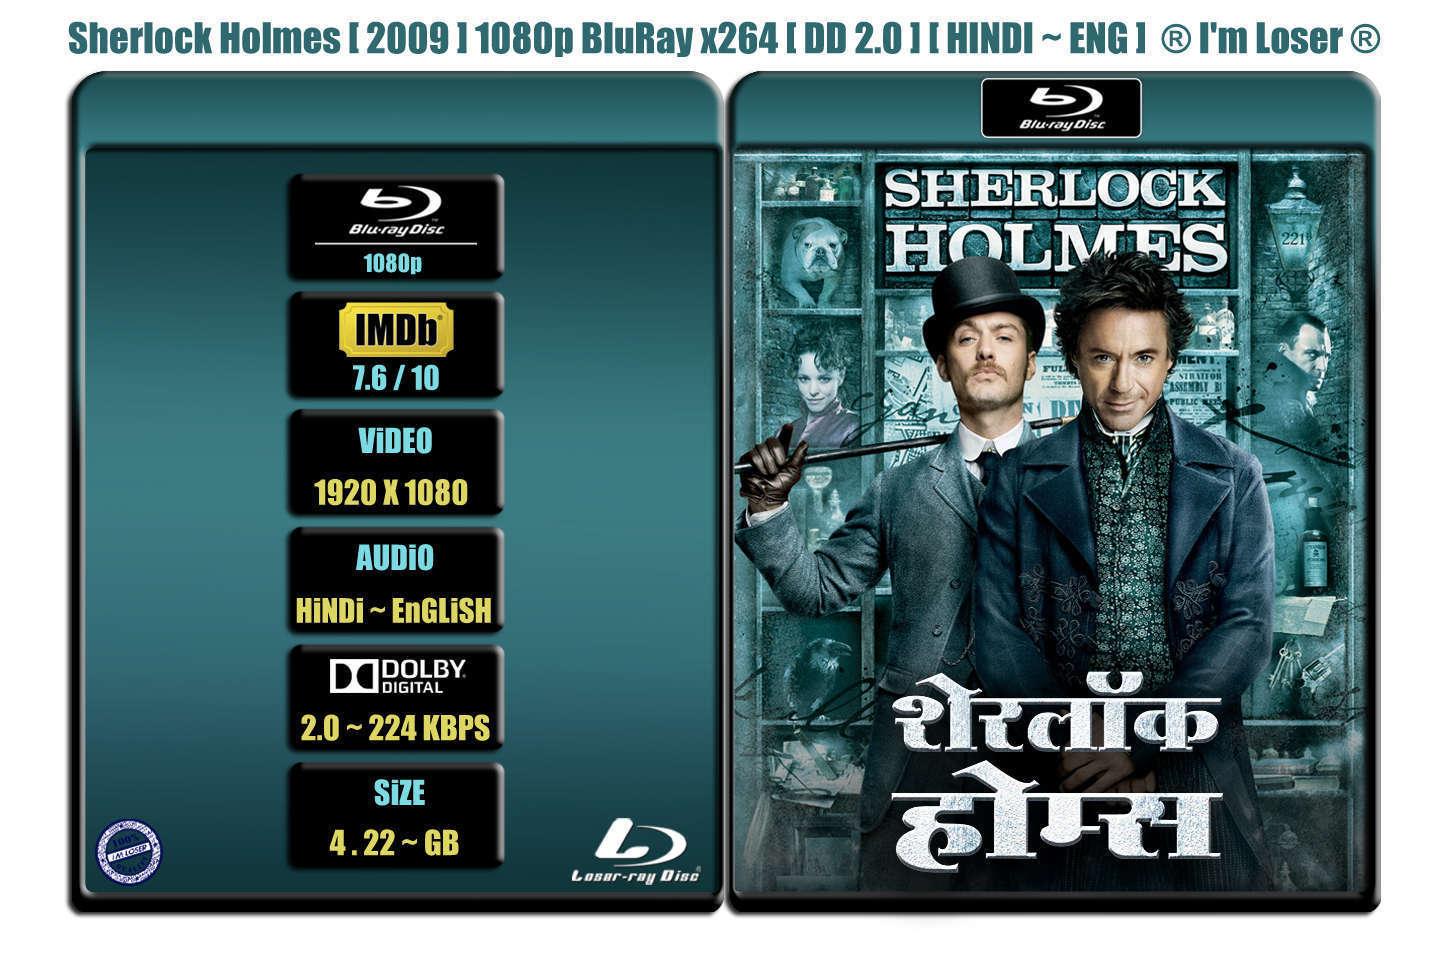 Sherlock Holmes [2009] 1080p BluRay x264 [DD 2.0] [HINDI - ENG ...